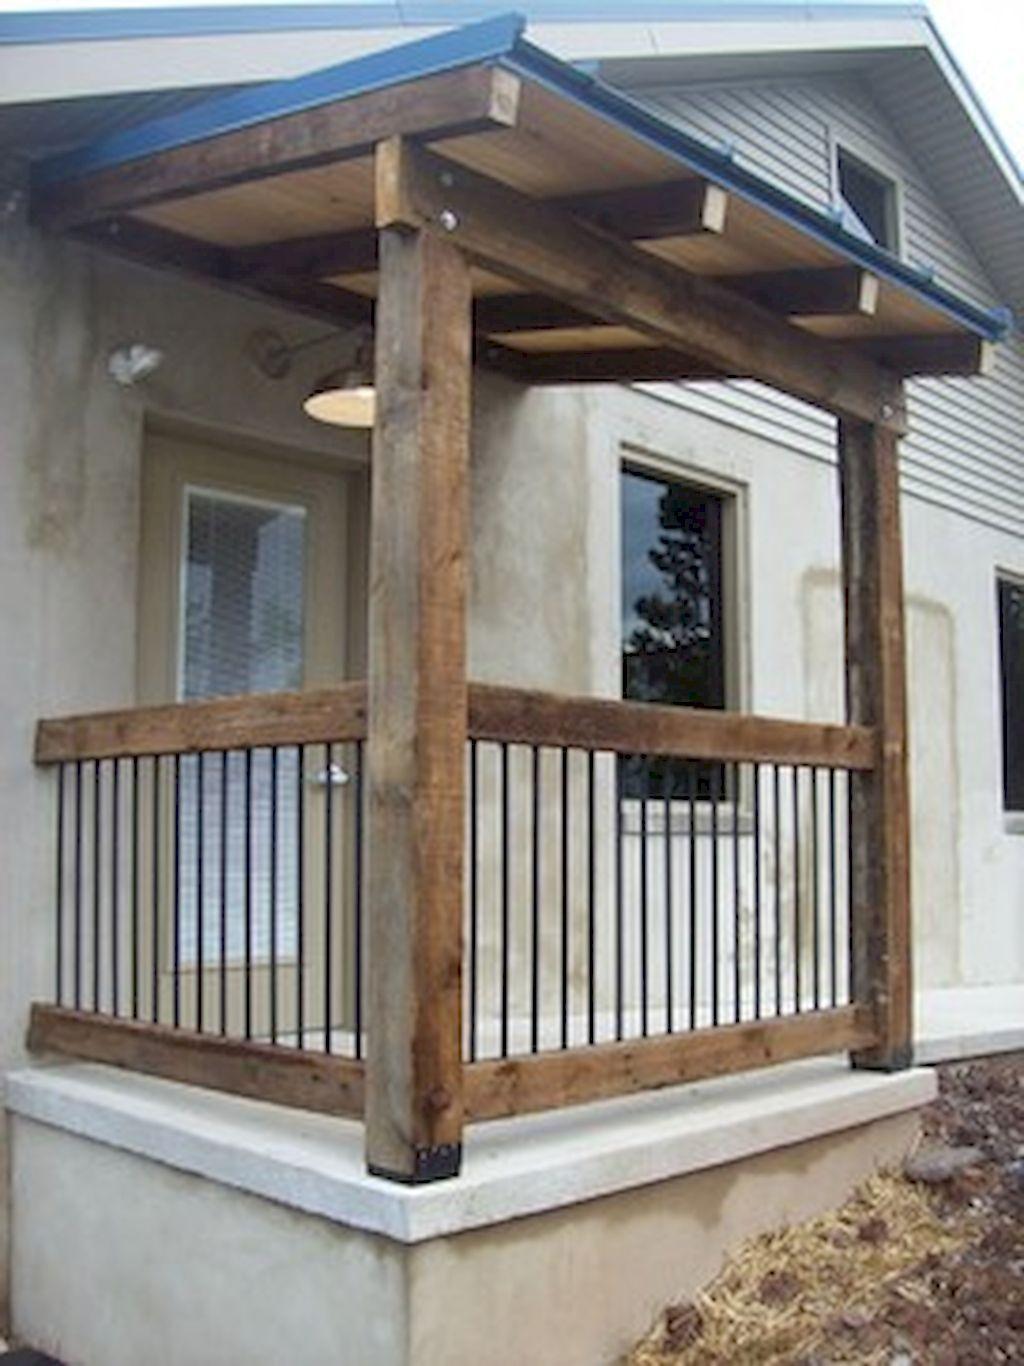 65 Stunning Farmhouse Porch Railing Decor Ideas 50 Railings Outdoor Front Porch Railings House With Porch